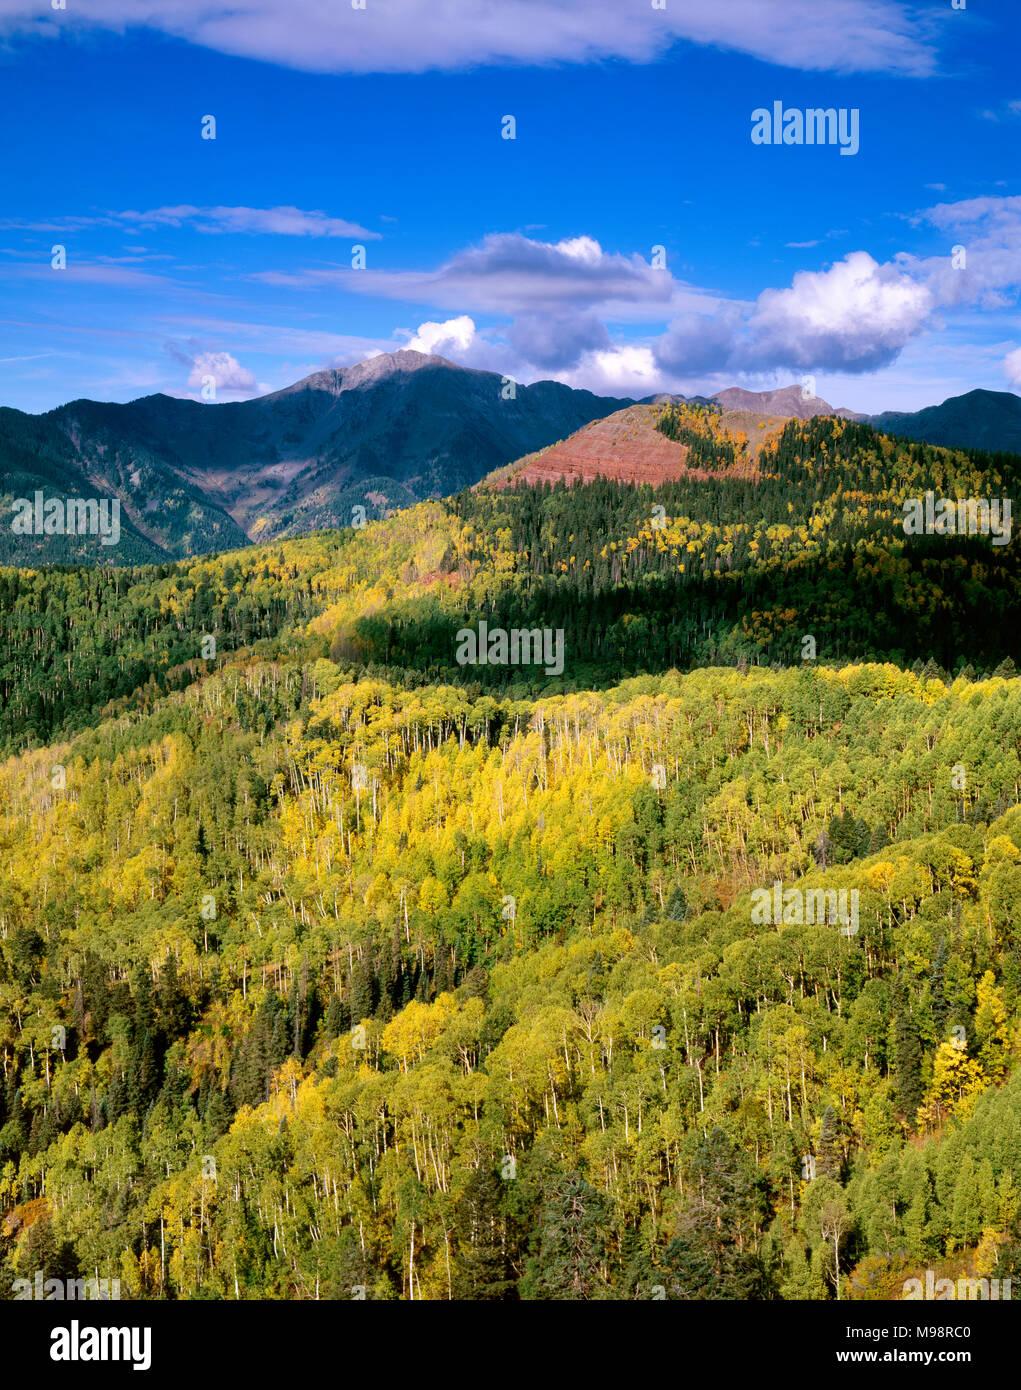 Silver Mountain, San Juan National Forest, Colorado - Stock Image